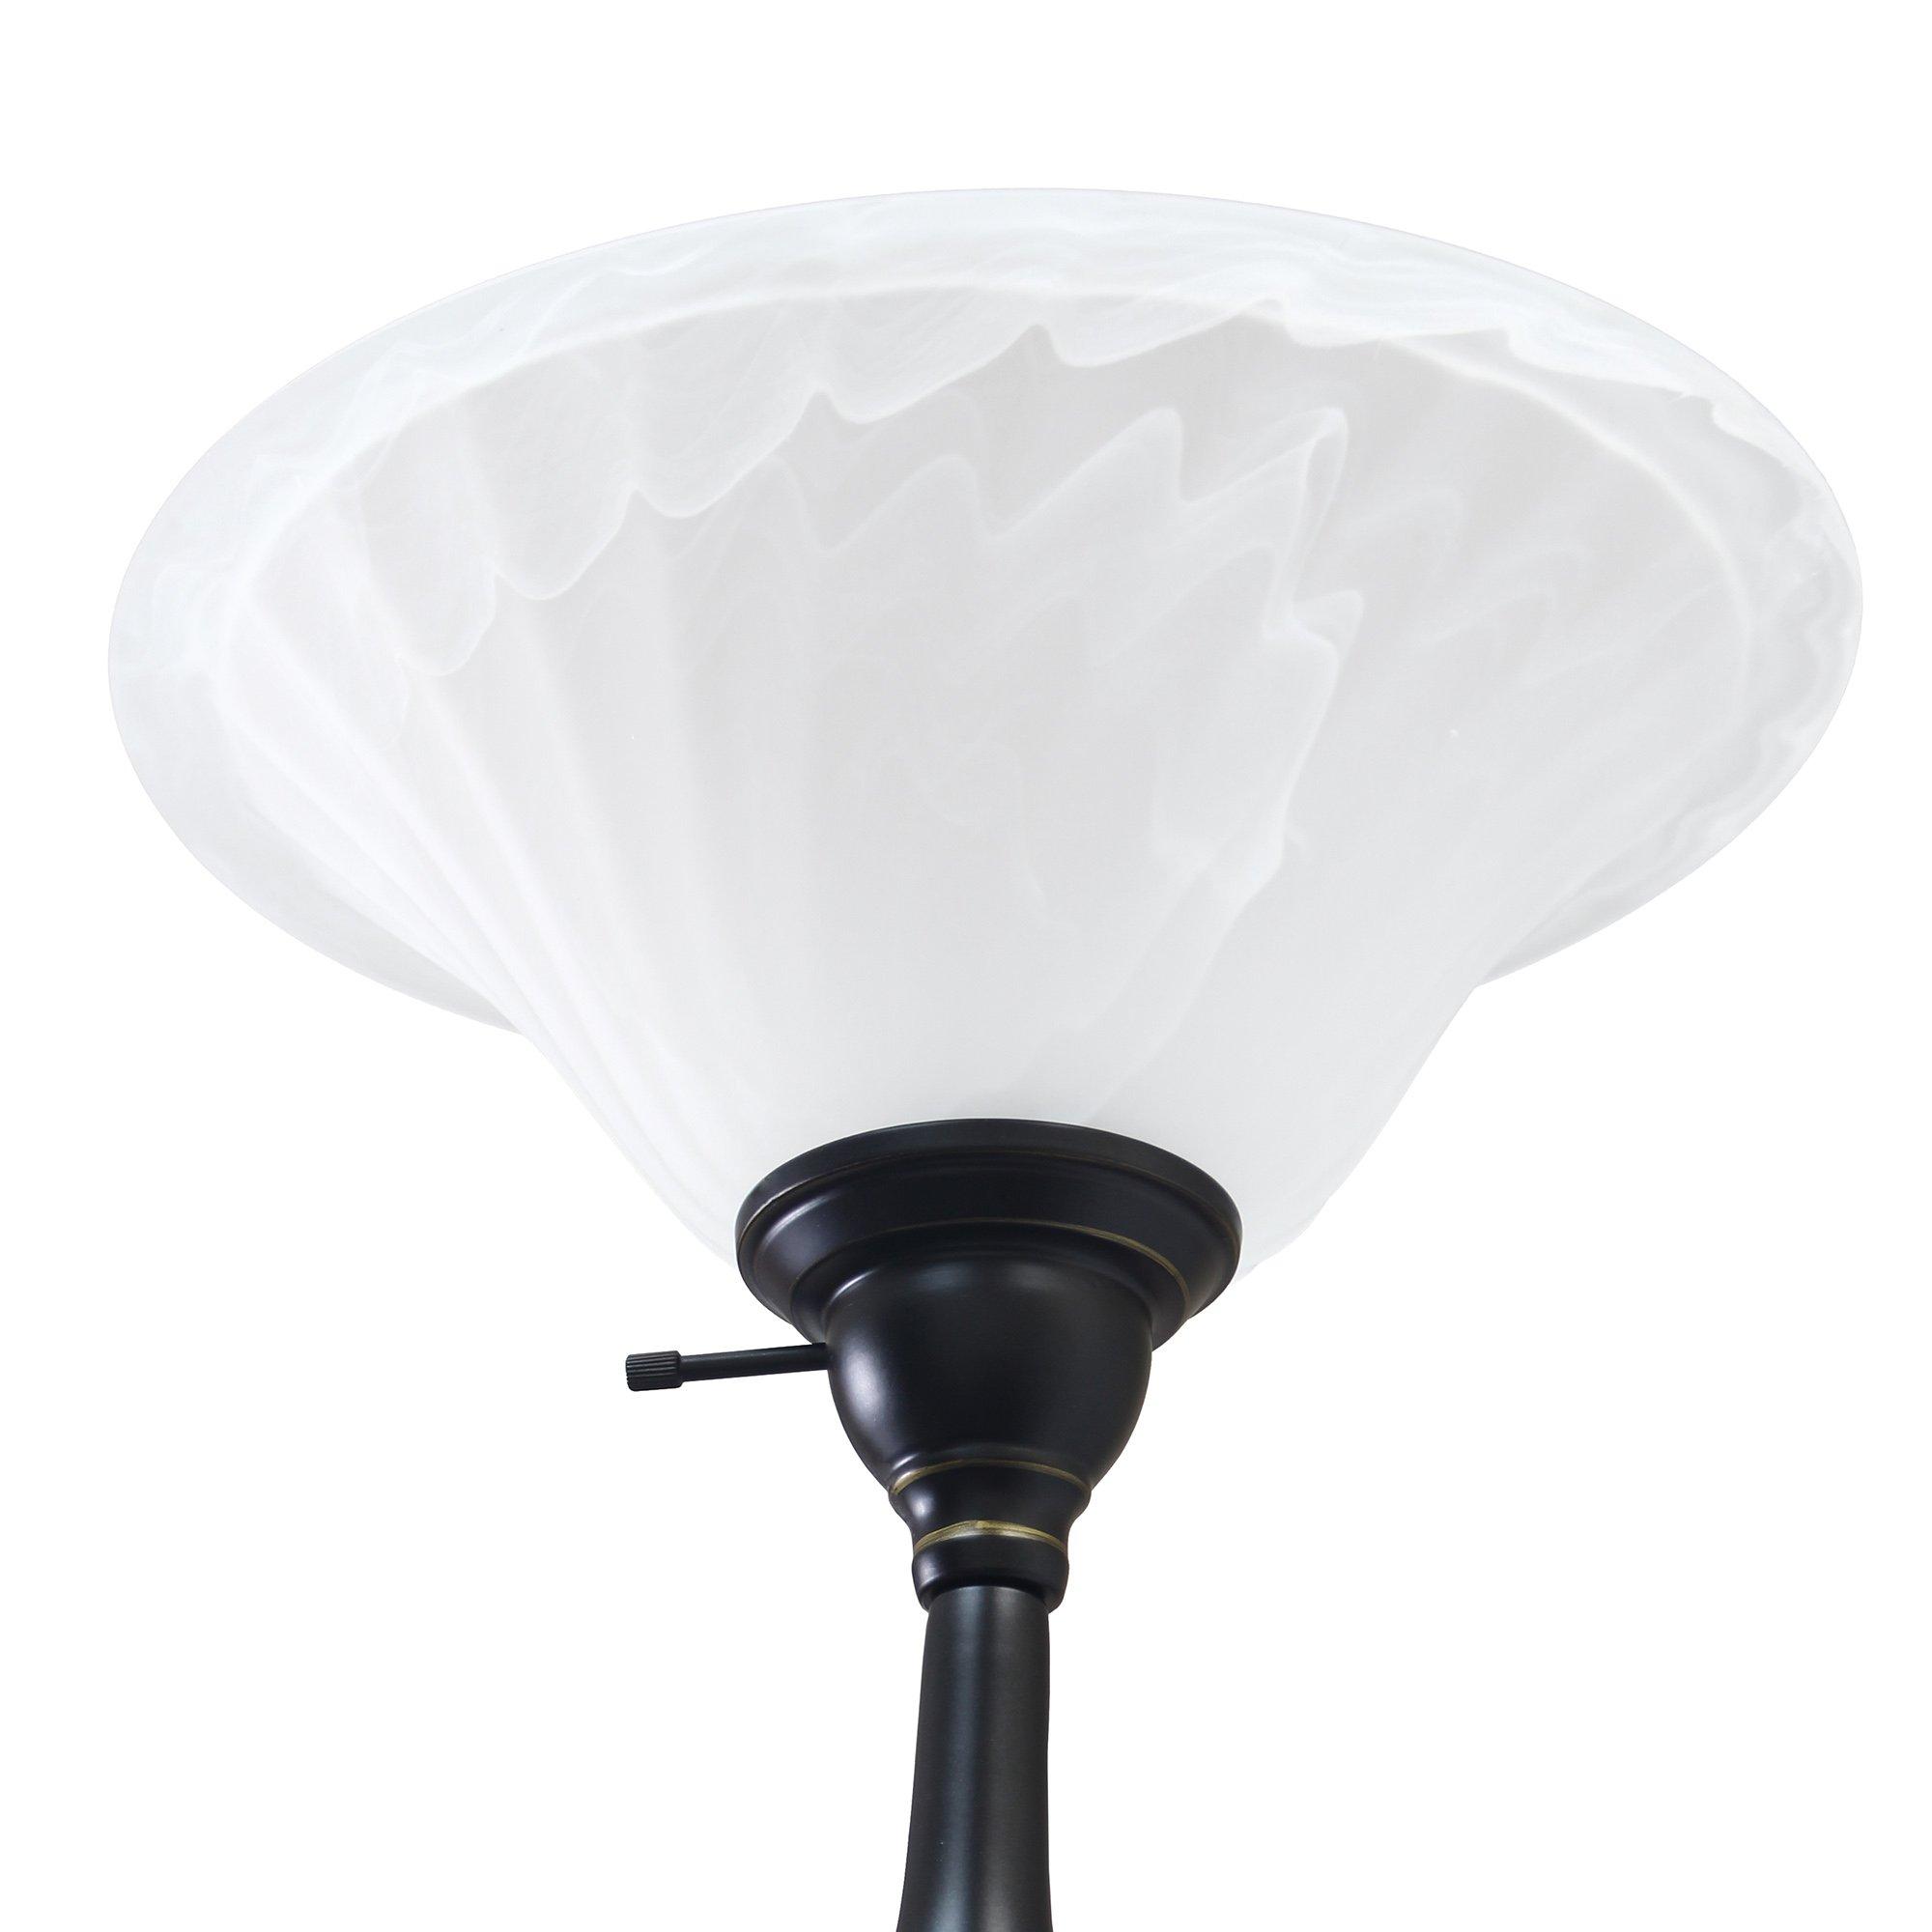 Elegant Designs LF2003-RBZ 2 Light Mother Daughter Floor Lamp with White Marble Glass,Restoration Bronze by Elegant Designs (Image #6)